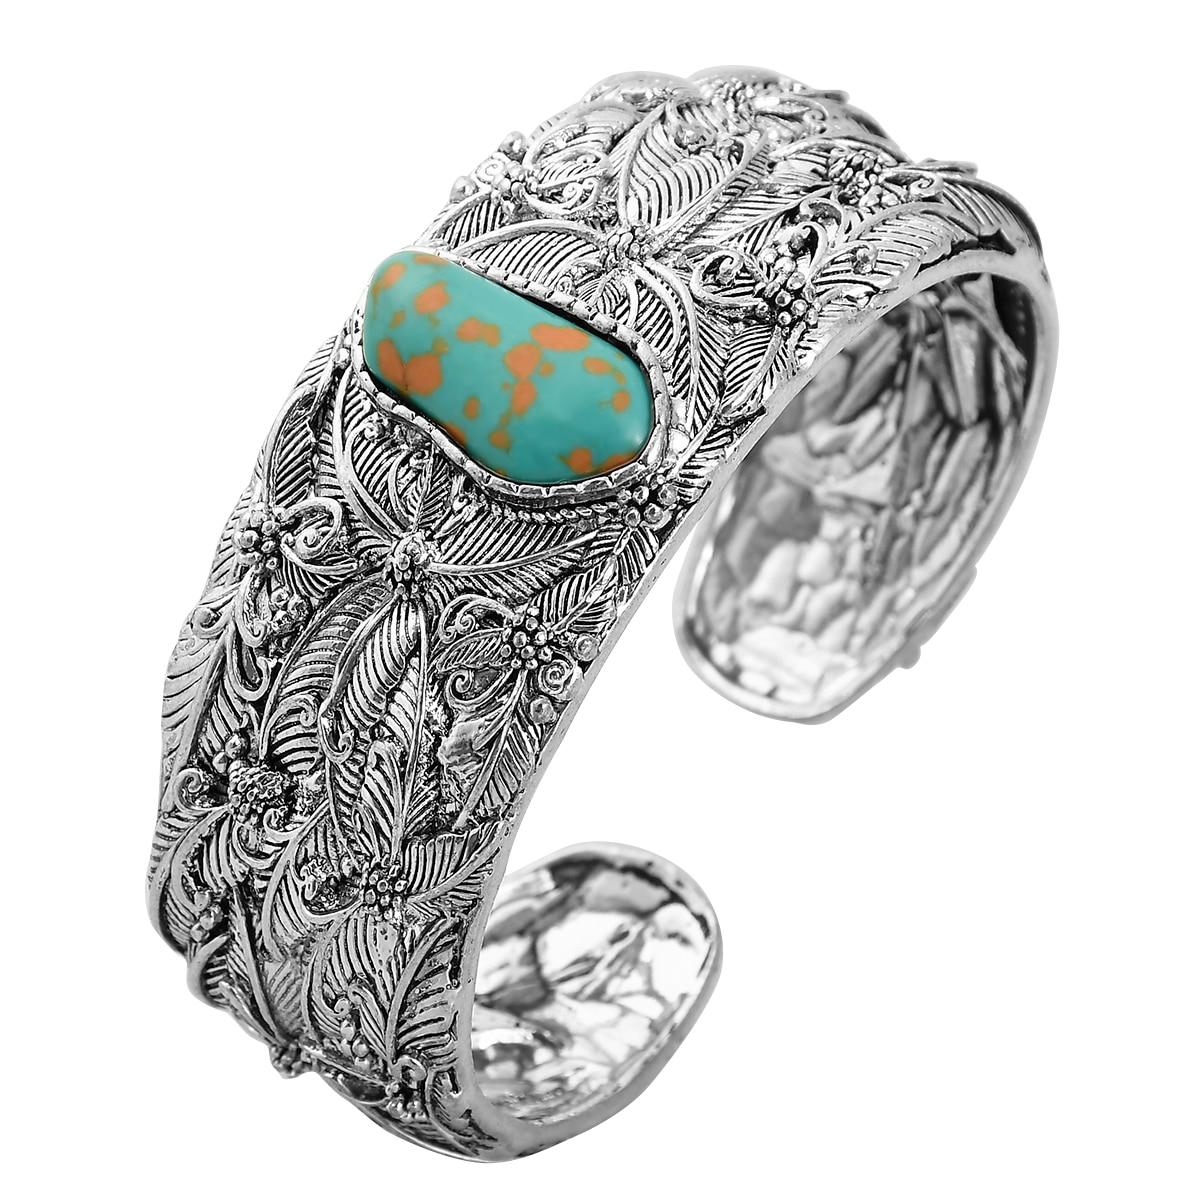 Joyería étnica de diseño único, brazalete de gran cristal abierto con brazo ancho, brazalete de piedra azul para hombres, brazalete llamativo para mujeres